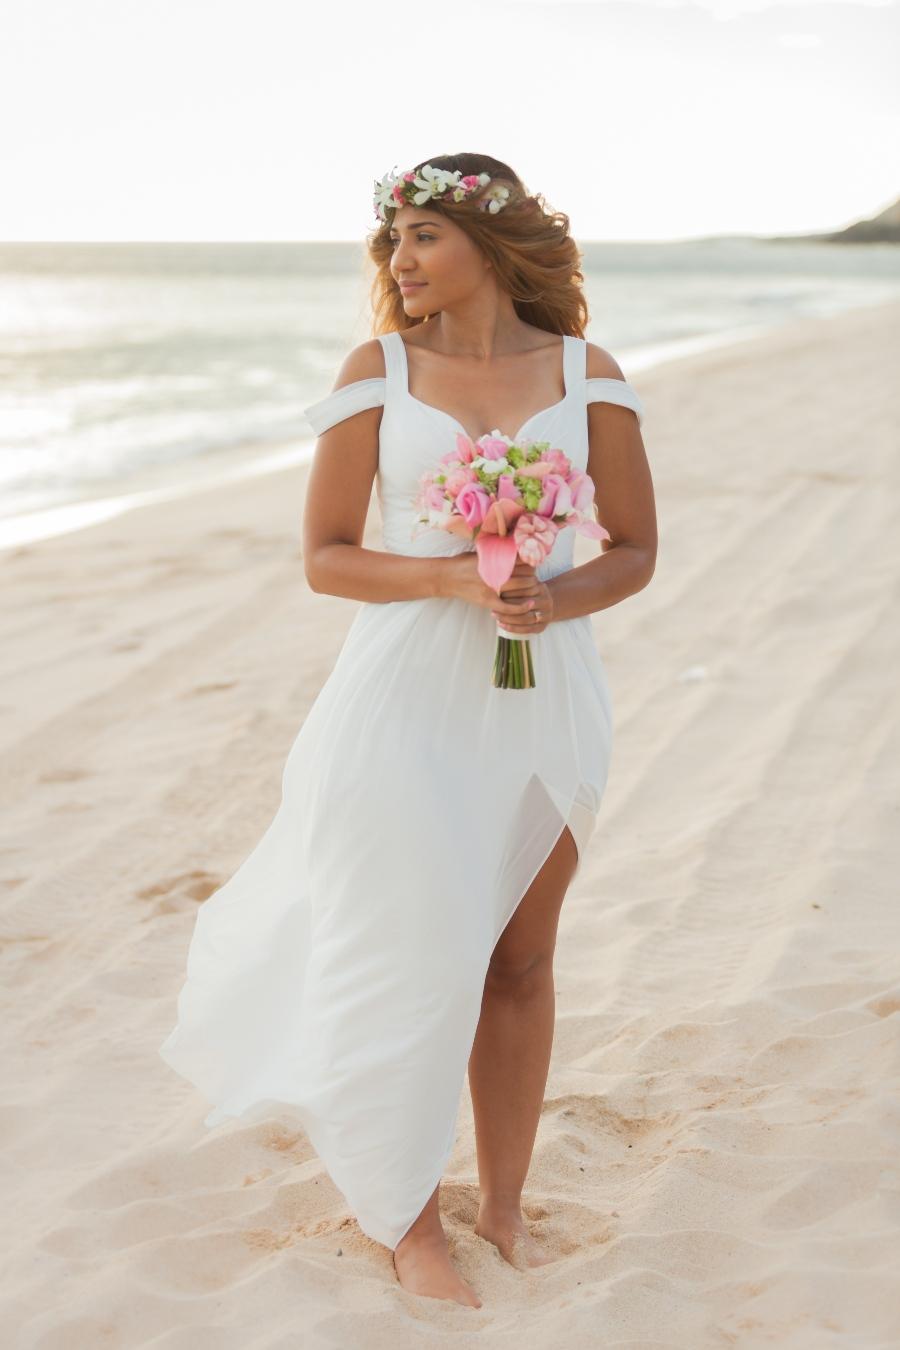 beach wedding attire tips for brides